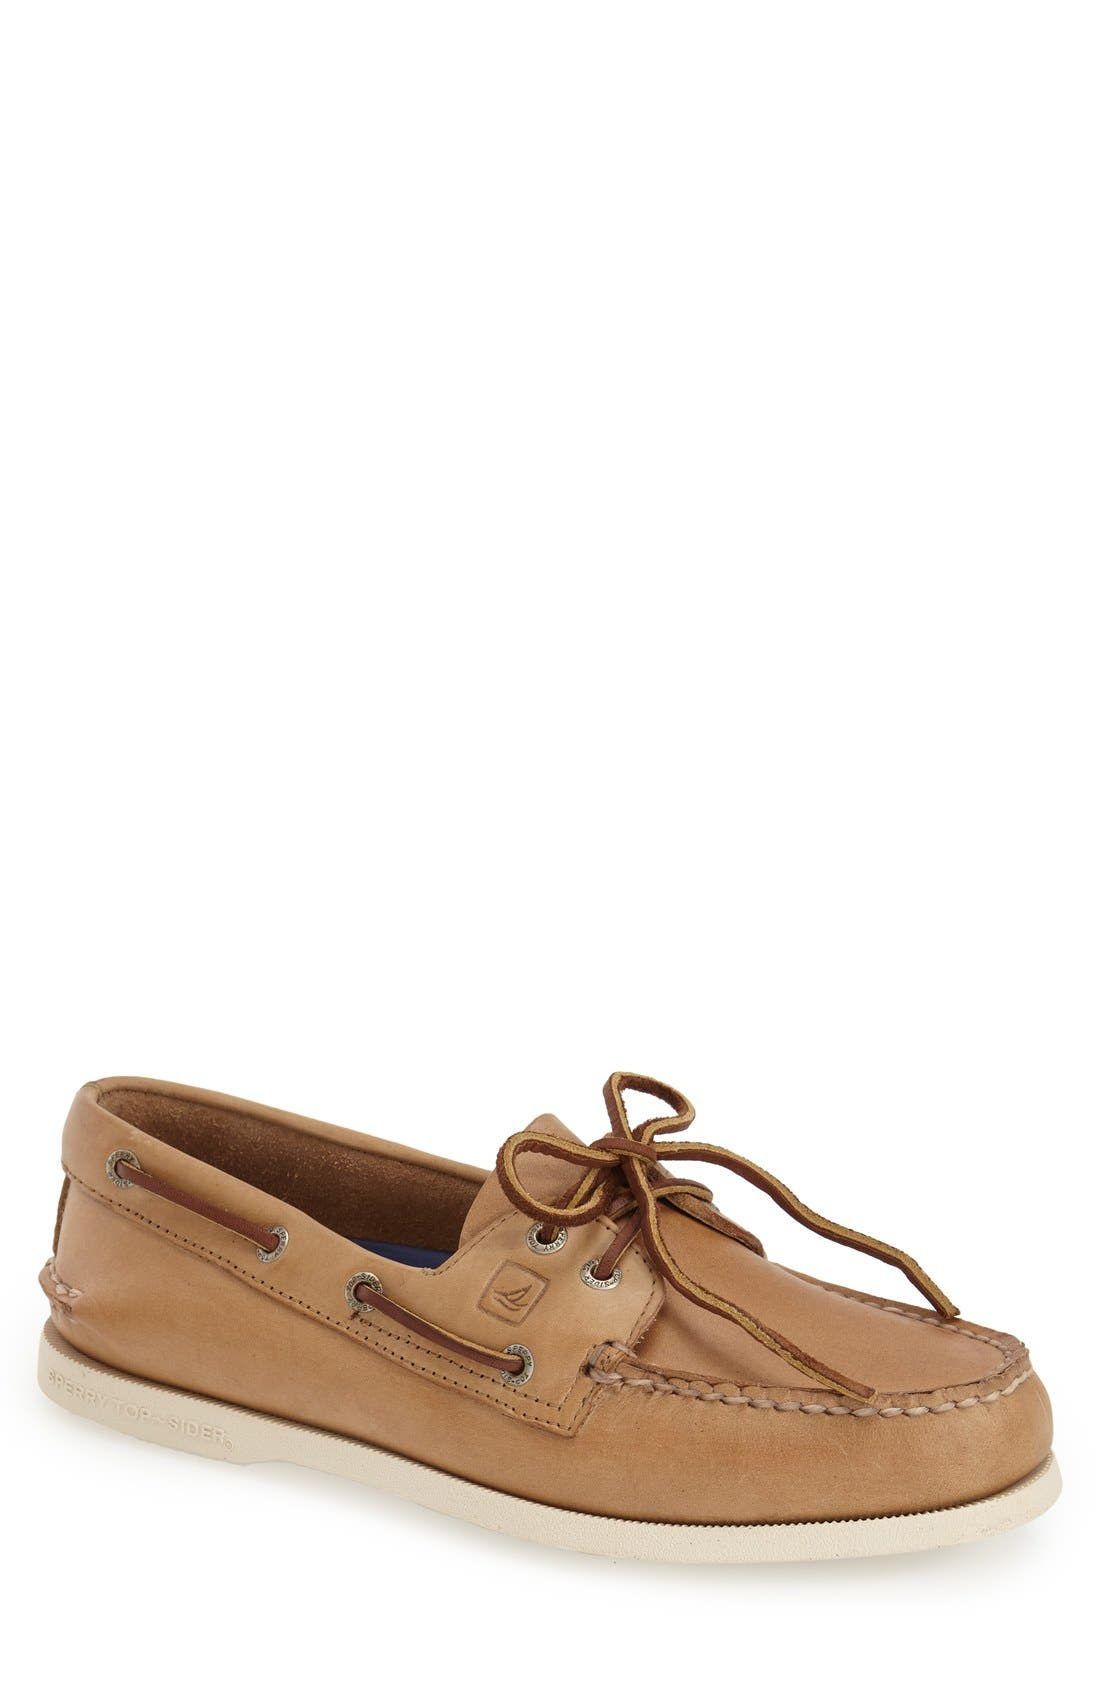 102323287066 Men s Boat Shoe Loafers   Slip-Ons